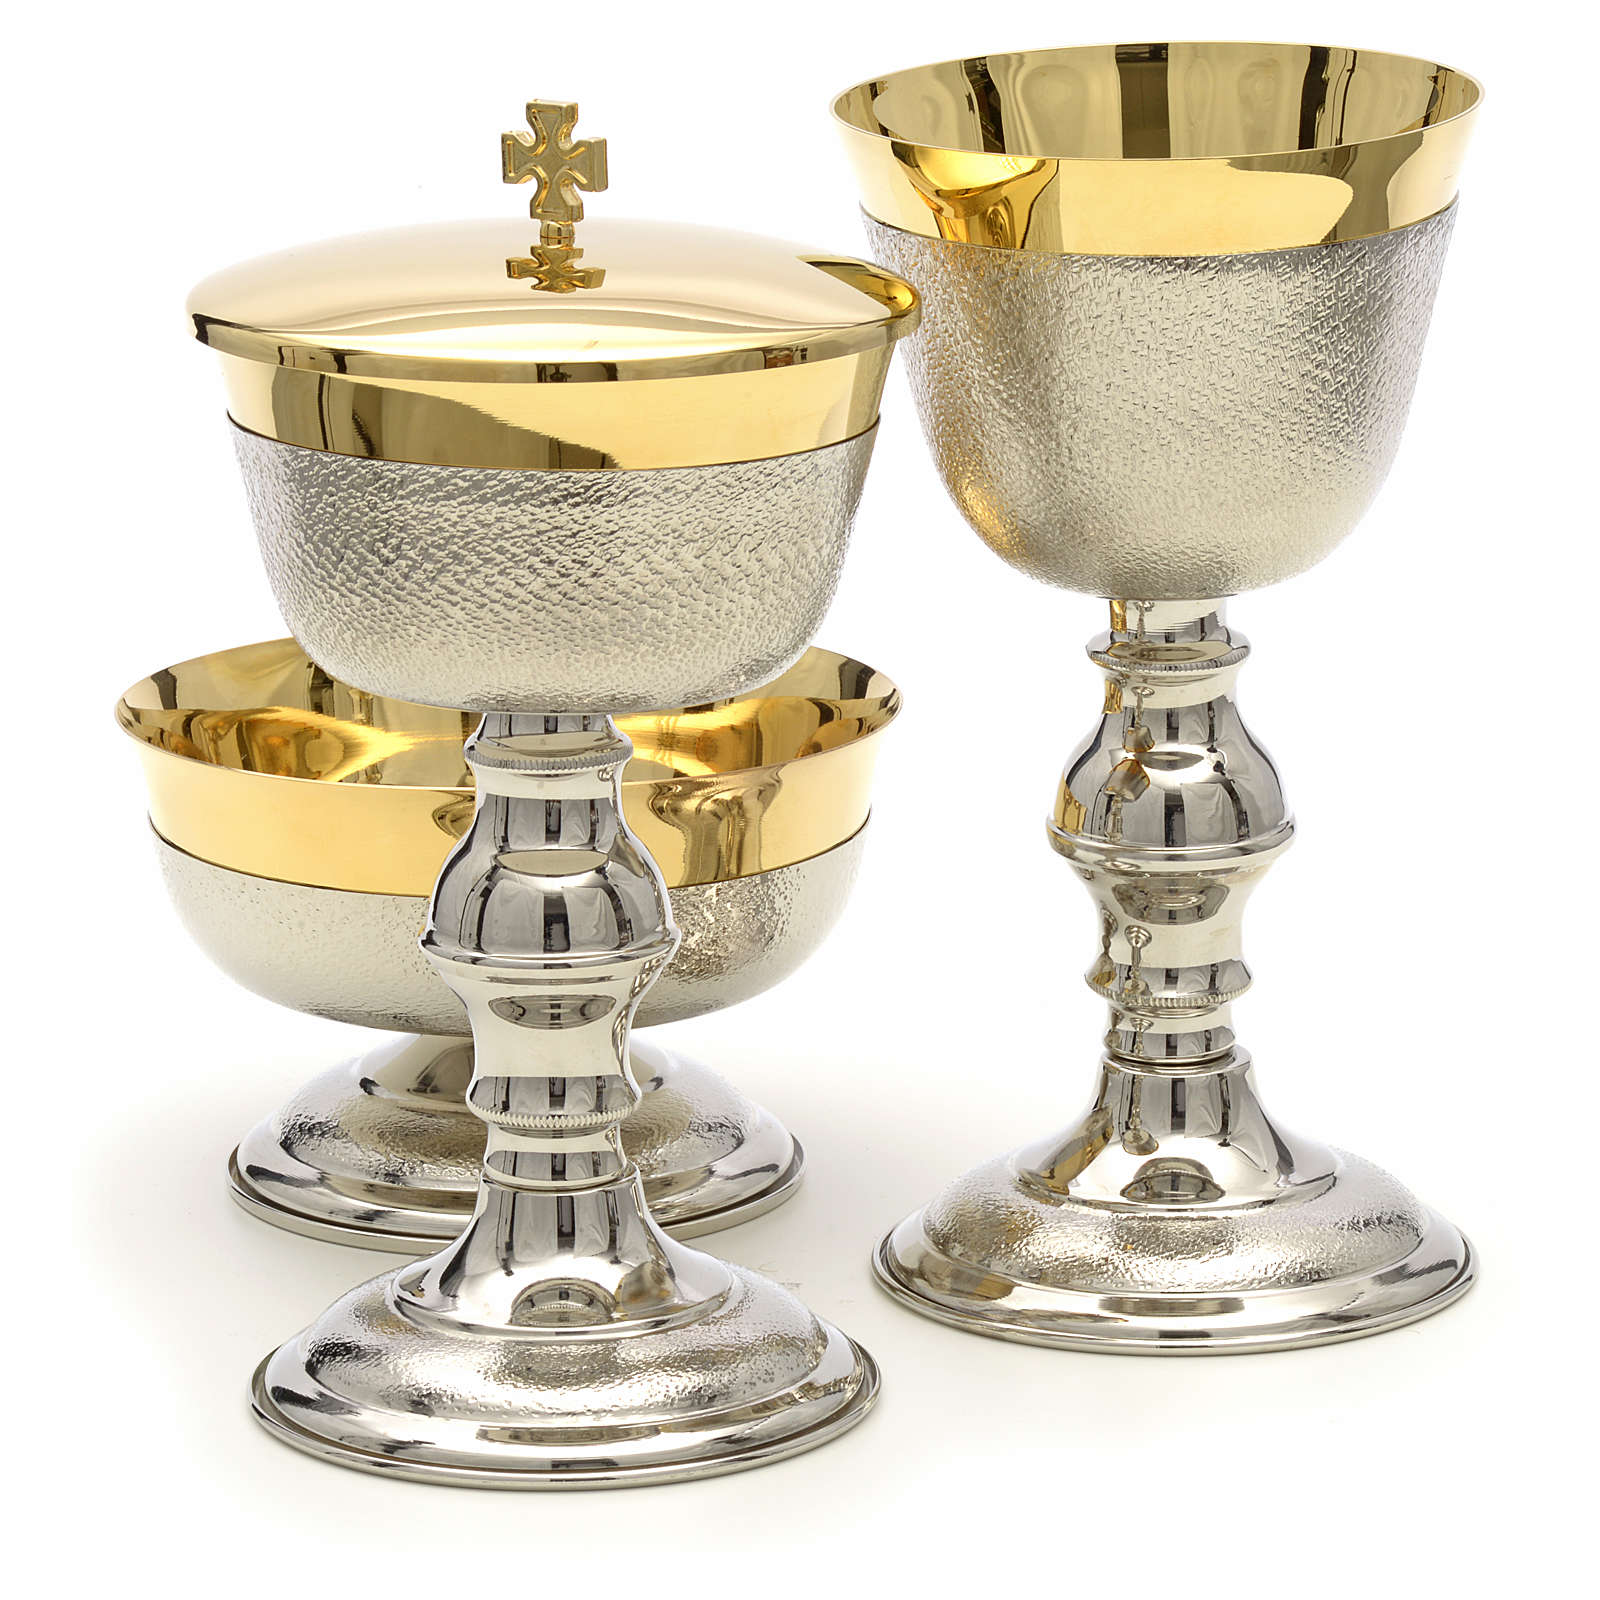 Chalice, ciborium and bowl with knurled finish 4